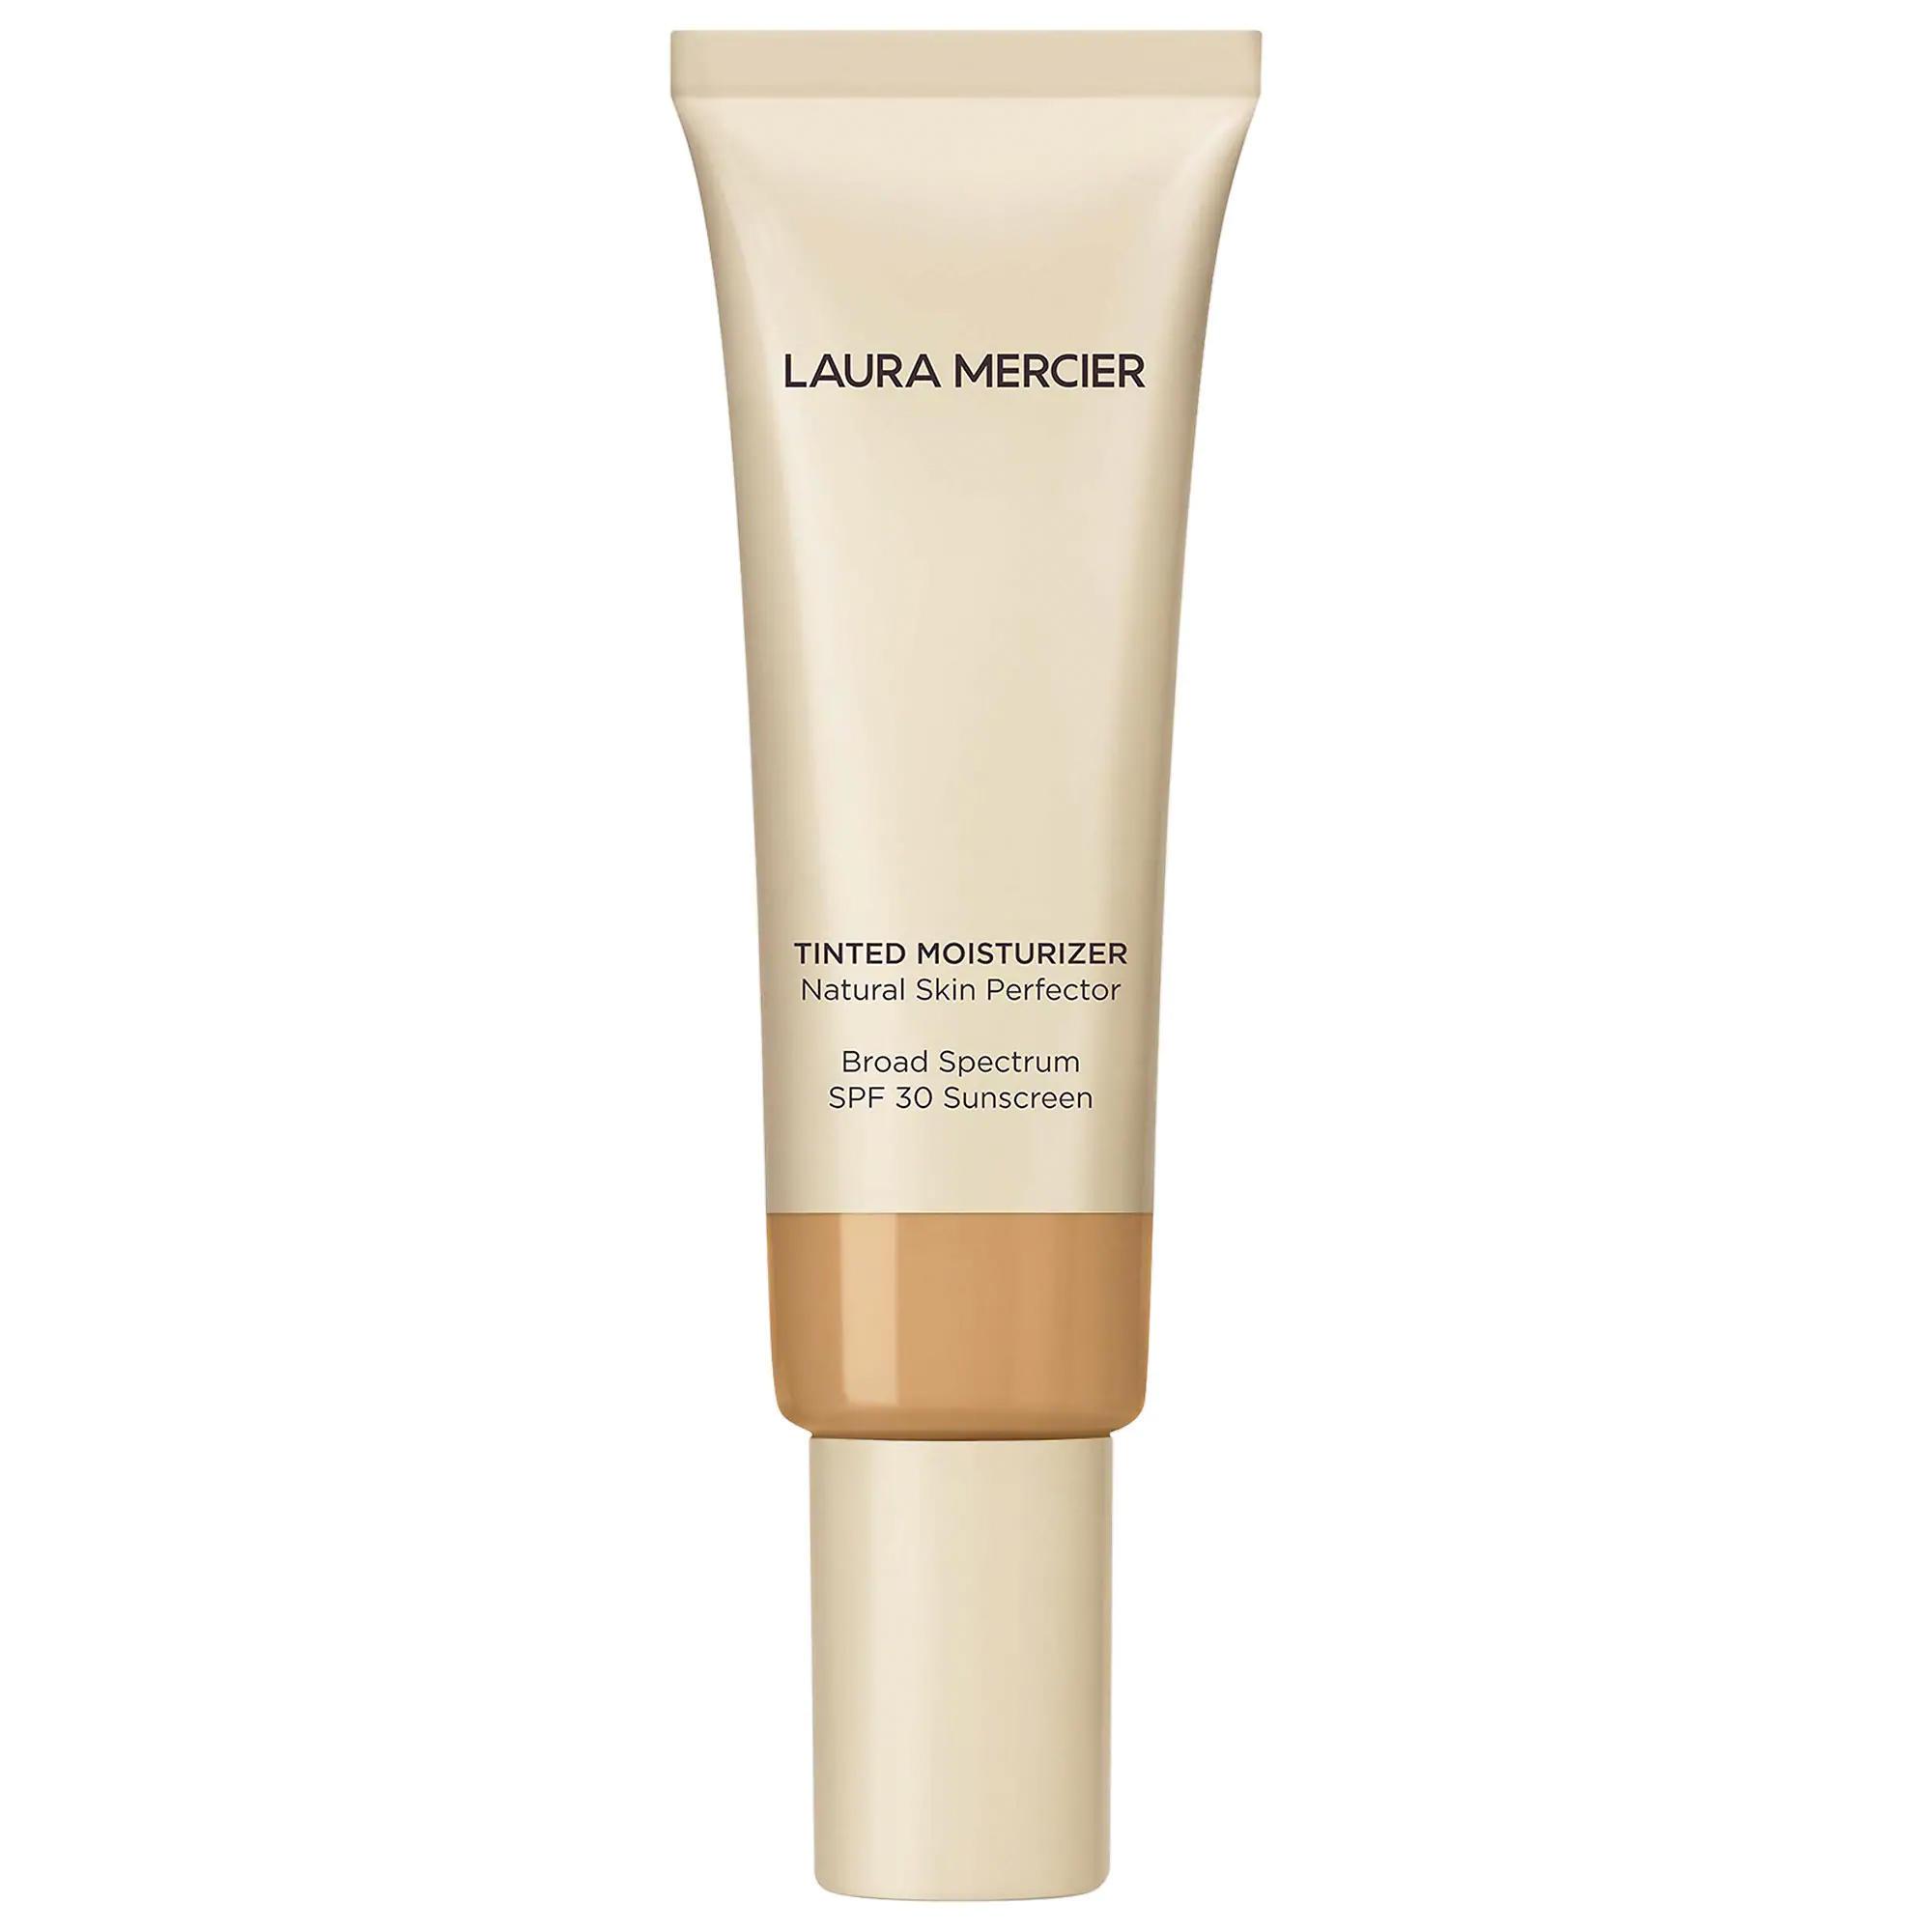 Laura Mercier Tinted Moisturizer Natural Skin Perfector Almond 4C1